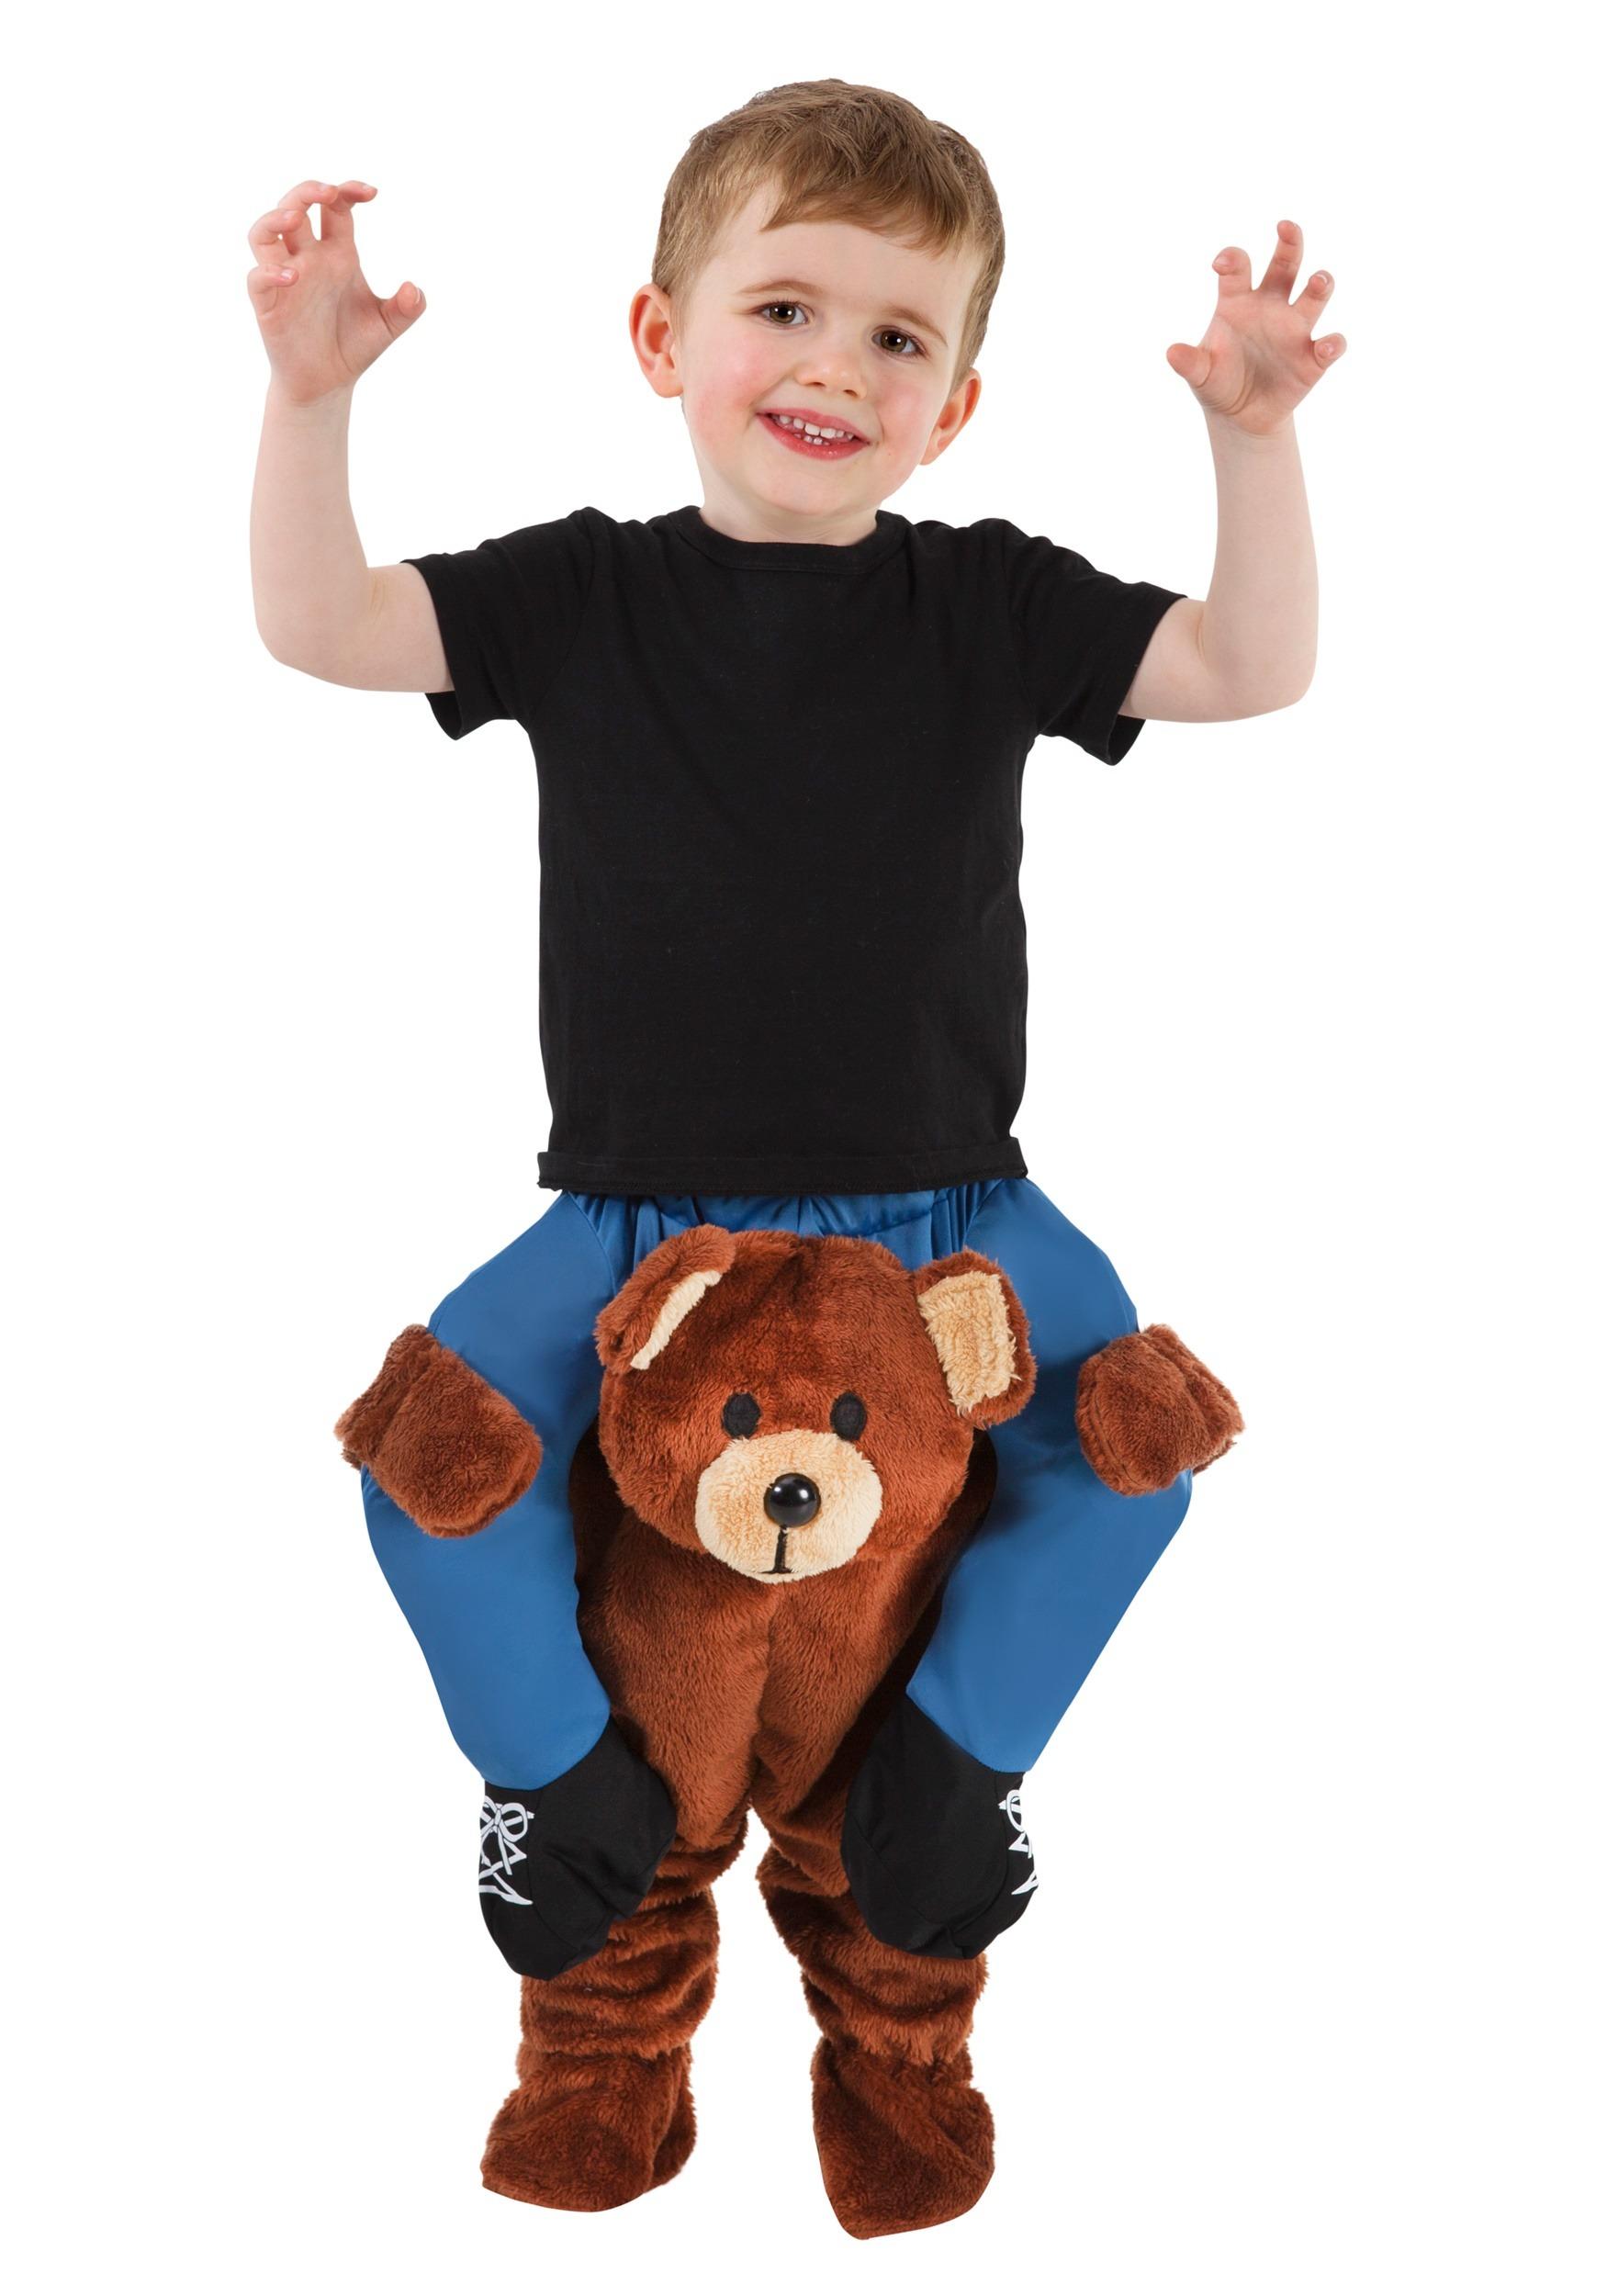 9fdcd45d9c52 Teddy Bear Piggyback Costume for a Toddler